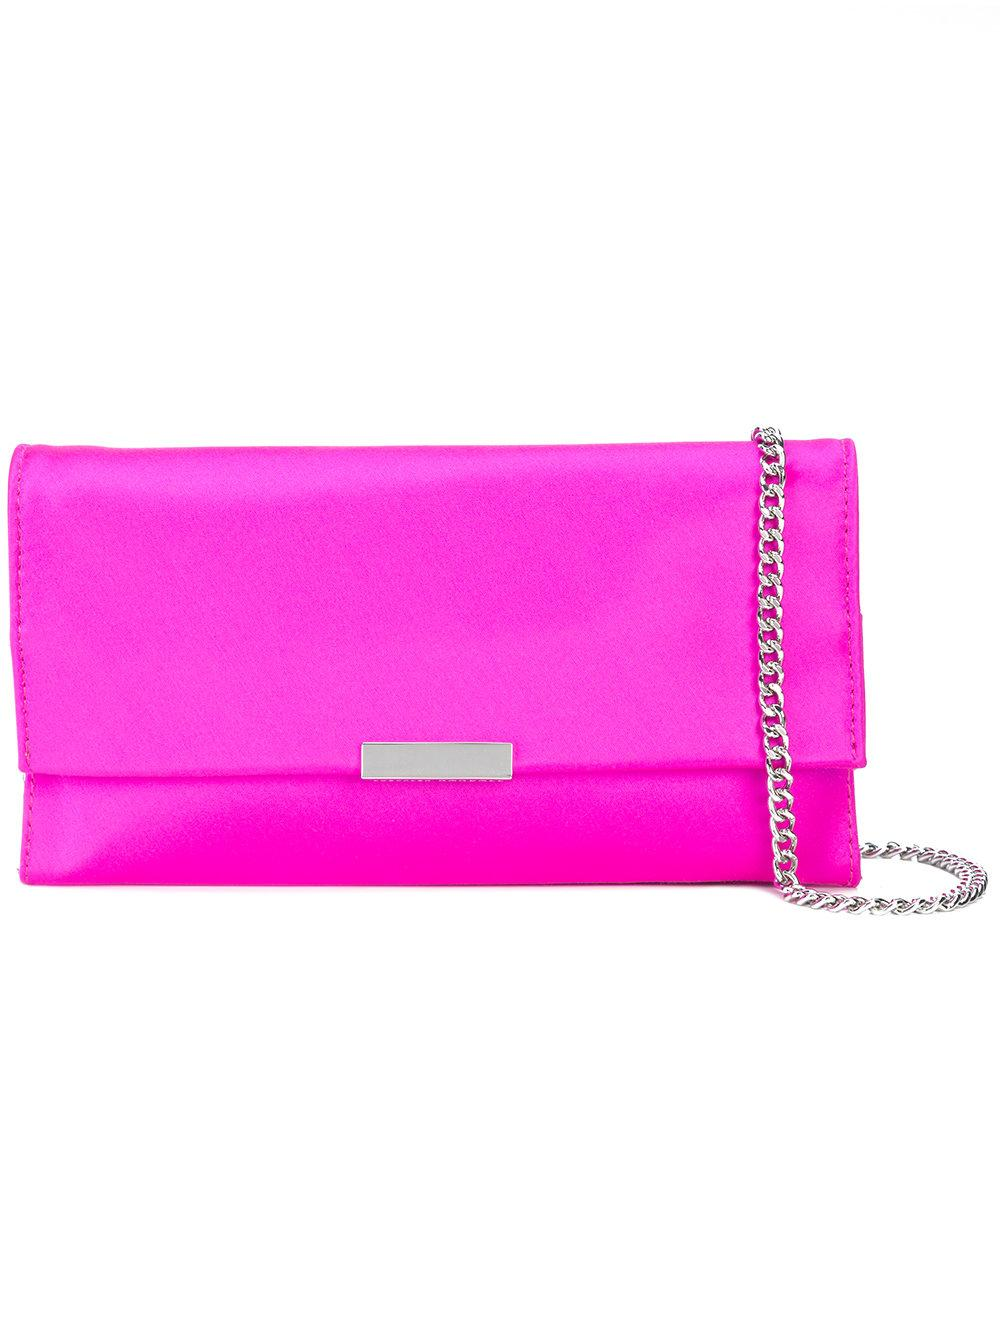 Loeffler Randall Slim Clutch Bag